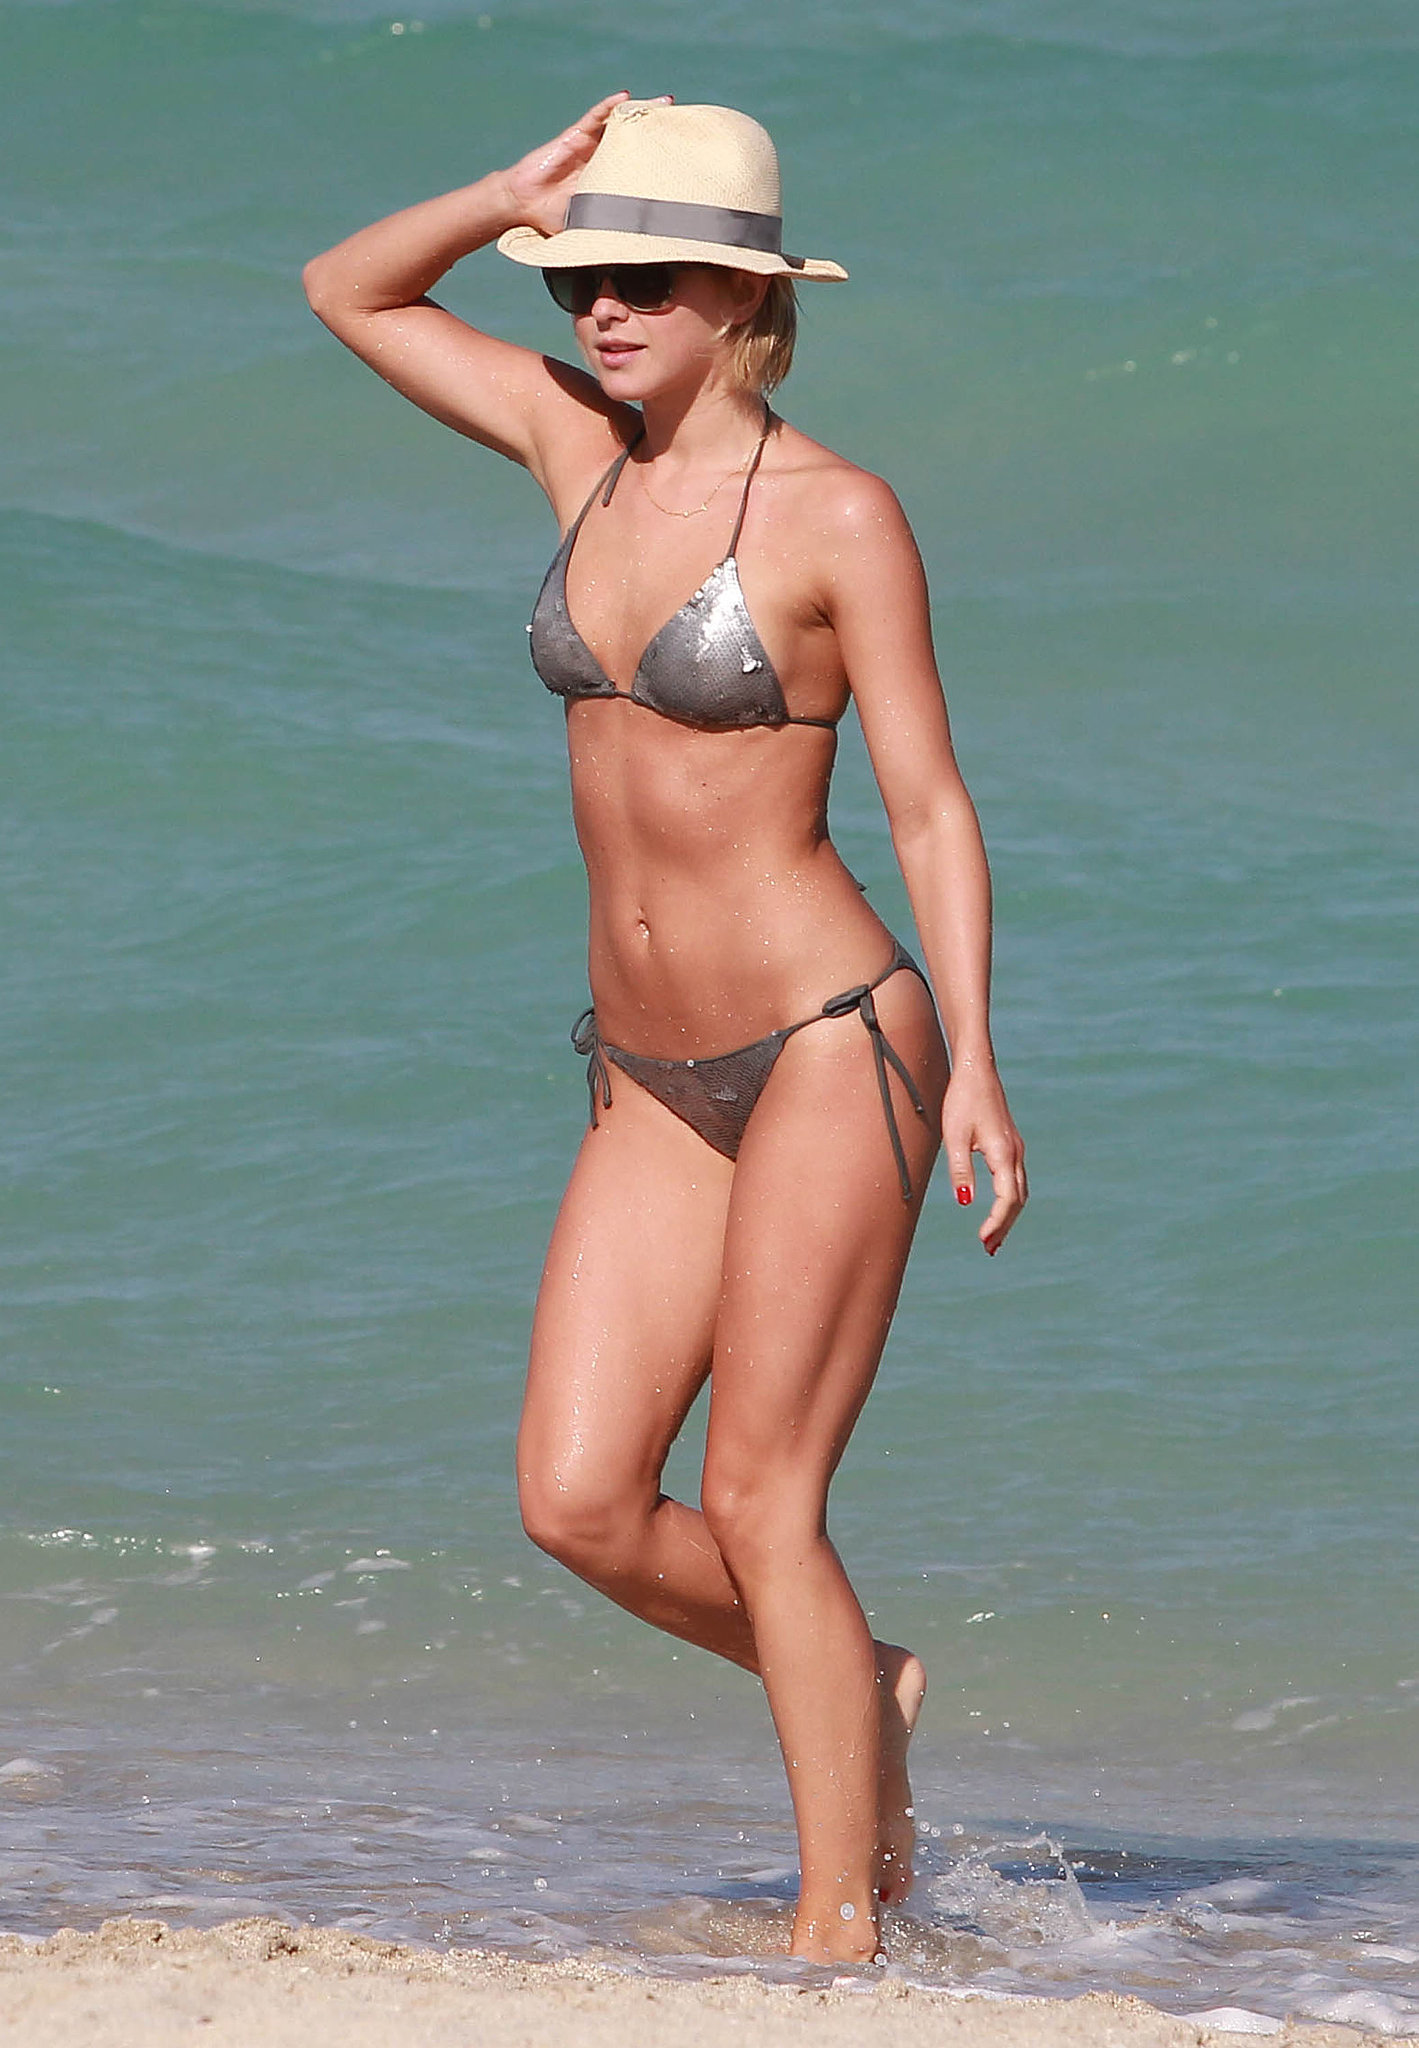 Julianne-Hough-got-out-water-Miami-April-2013